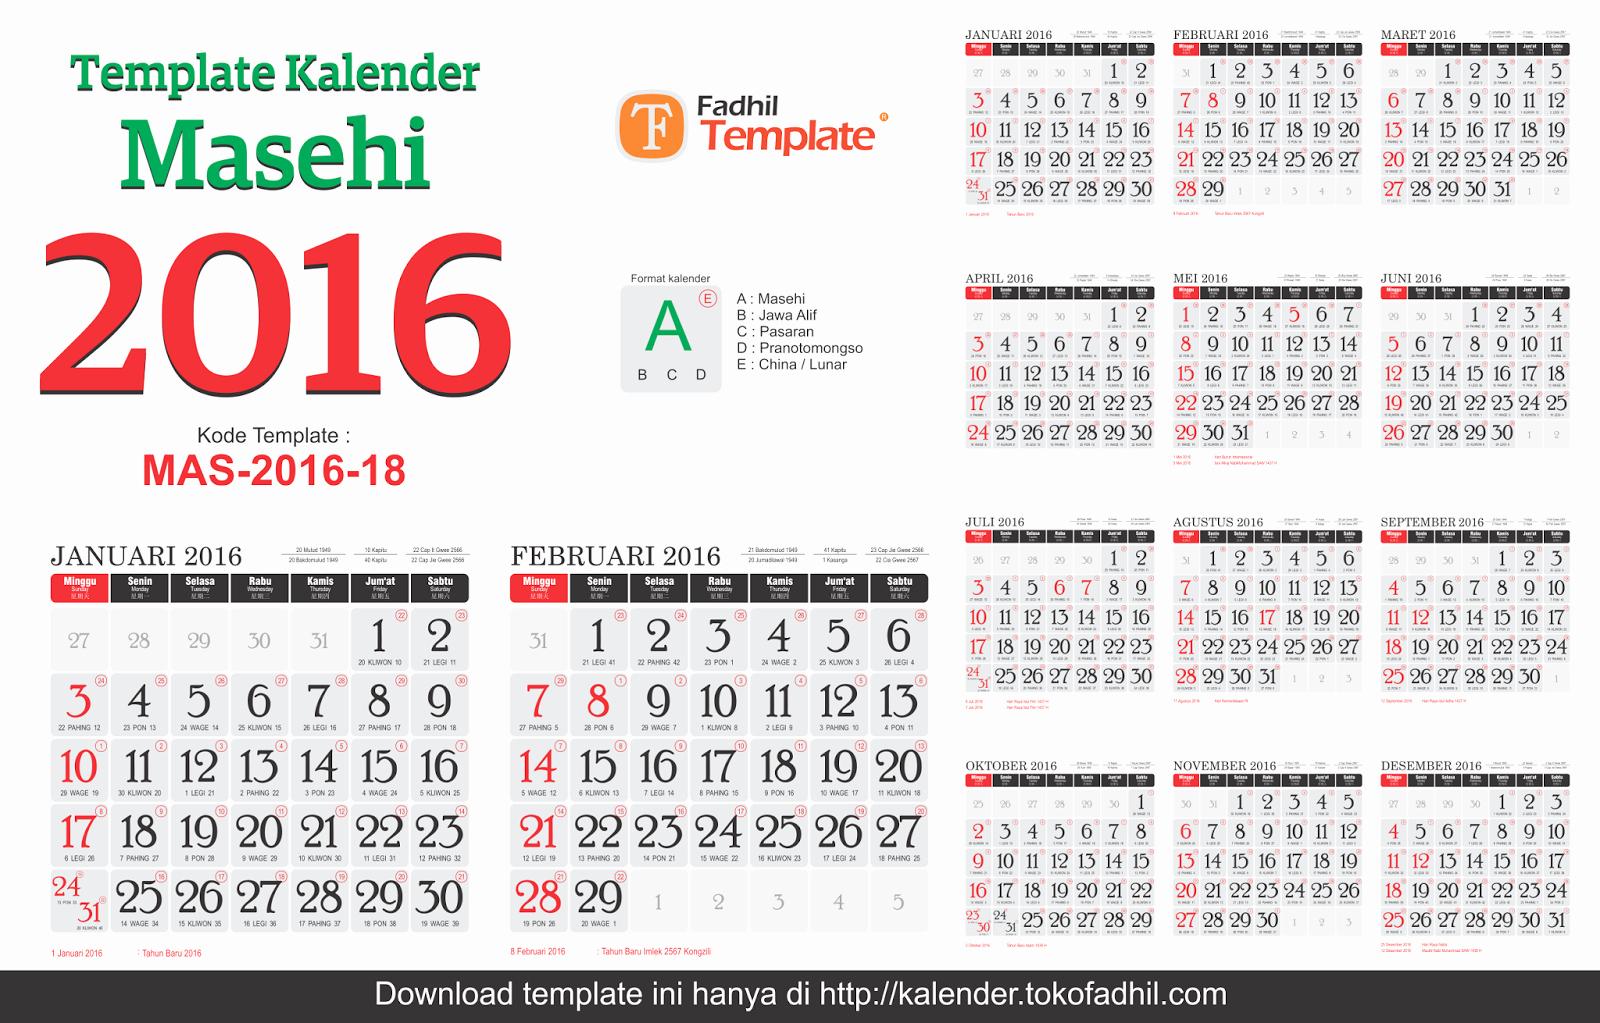 Editable Calendar 2016-17 Fresh Pusat Template Kalender Template Kalender 2016 18 Corel